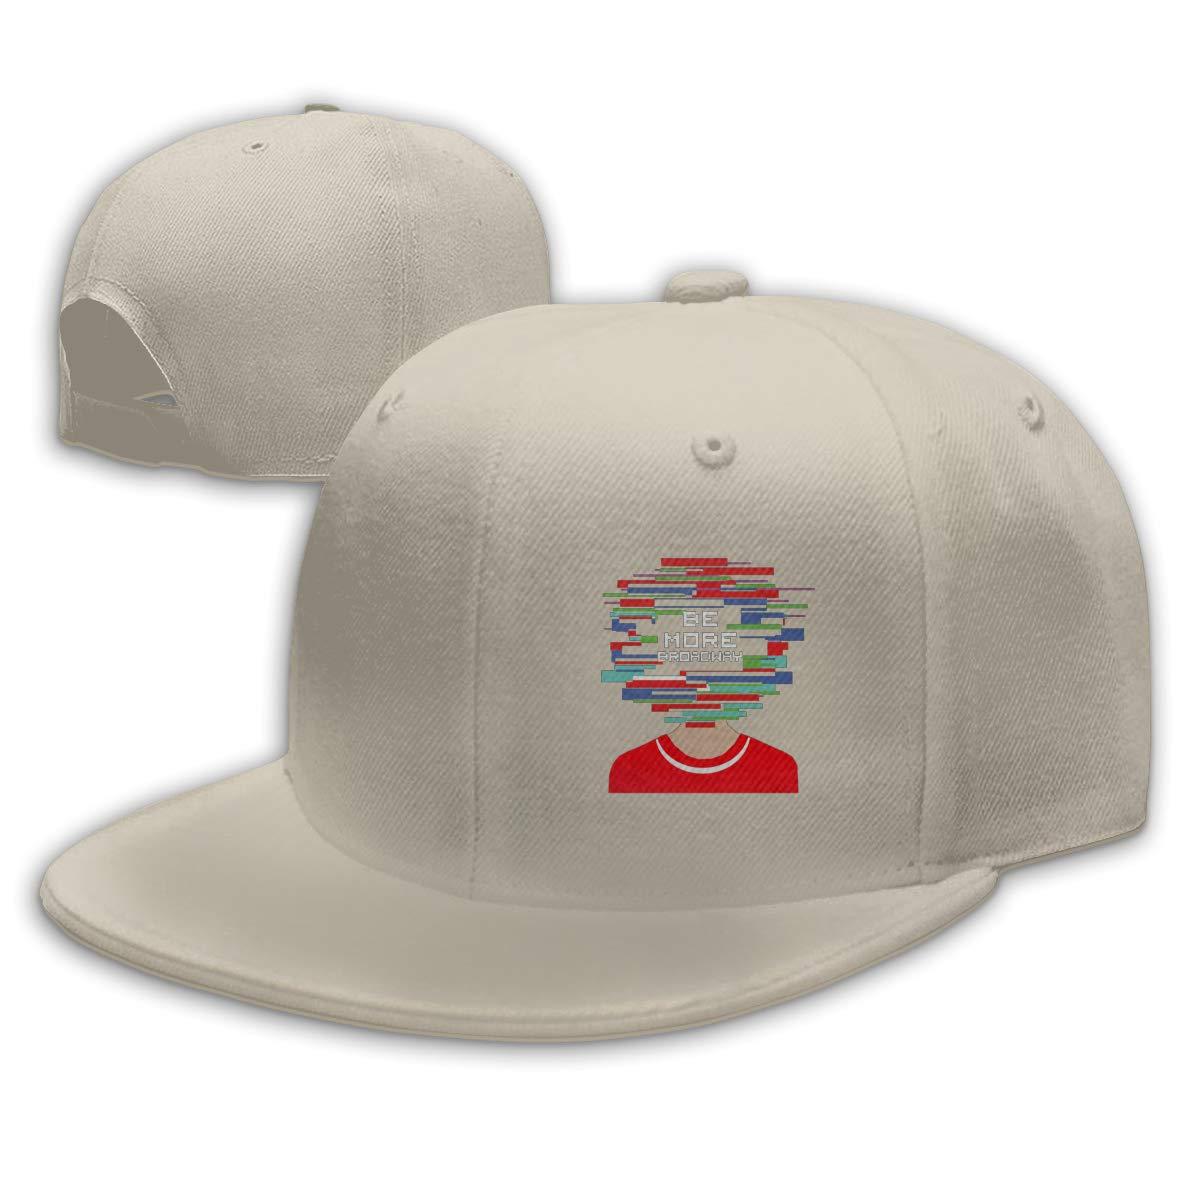 Monerla Ningpu Be More Chill Adjustable Denim Hats